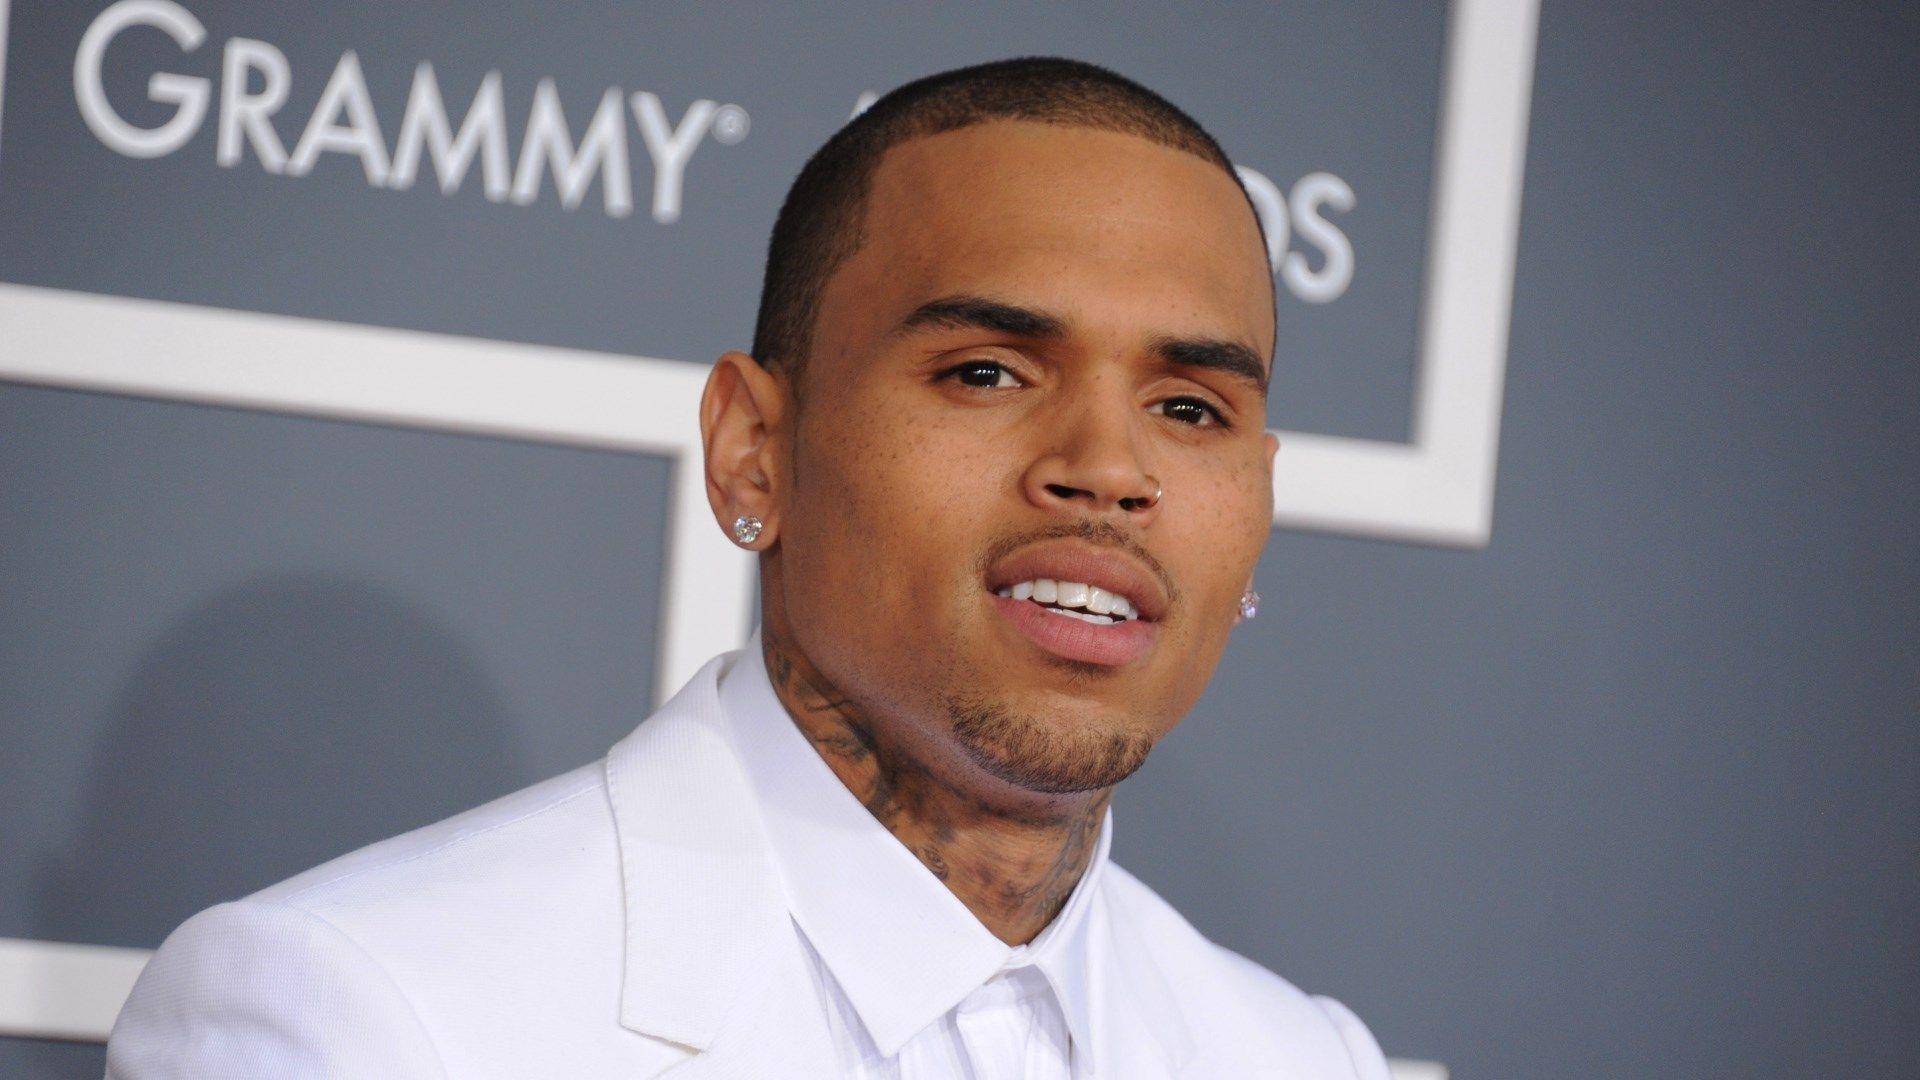 Photography: Chris Brown